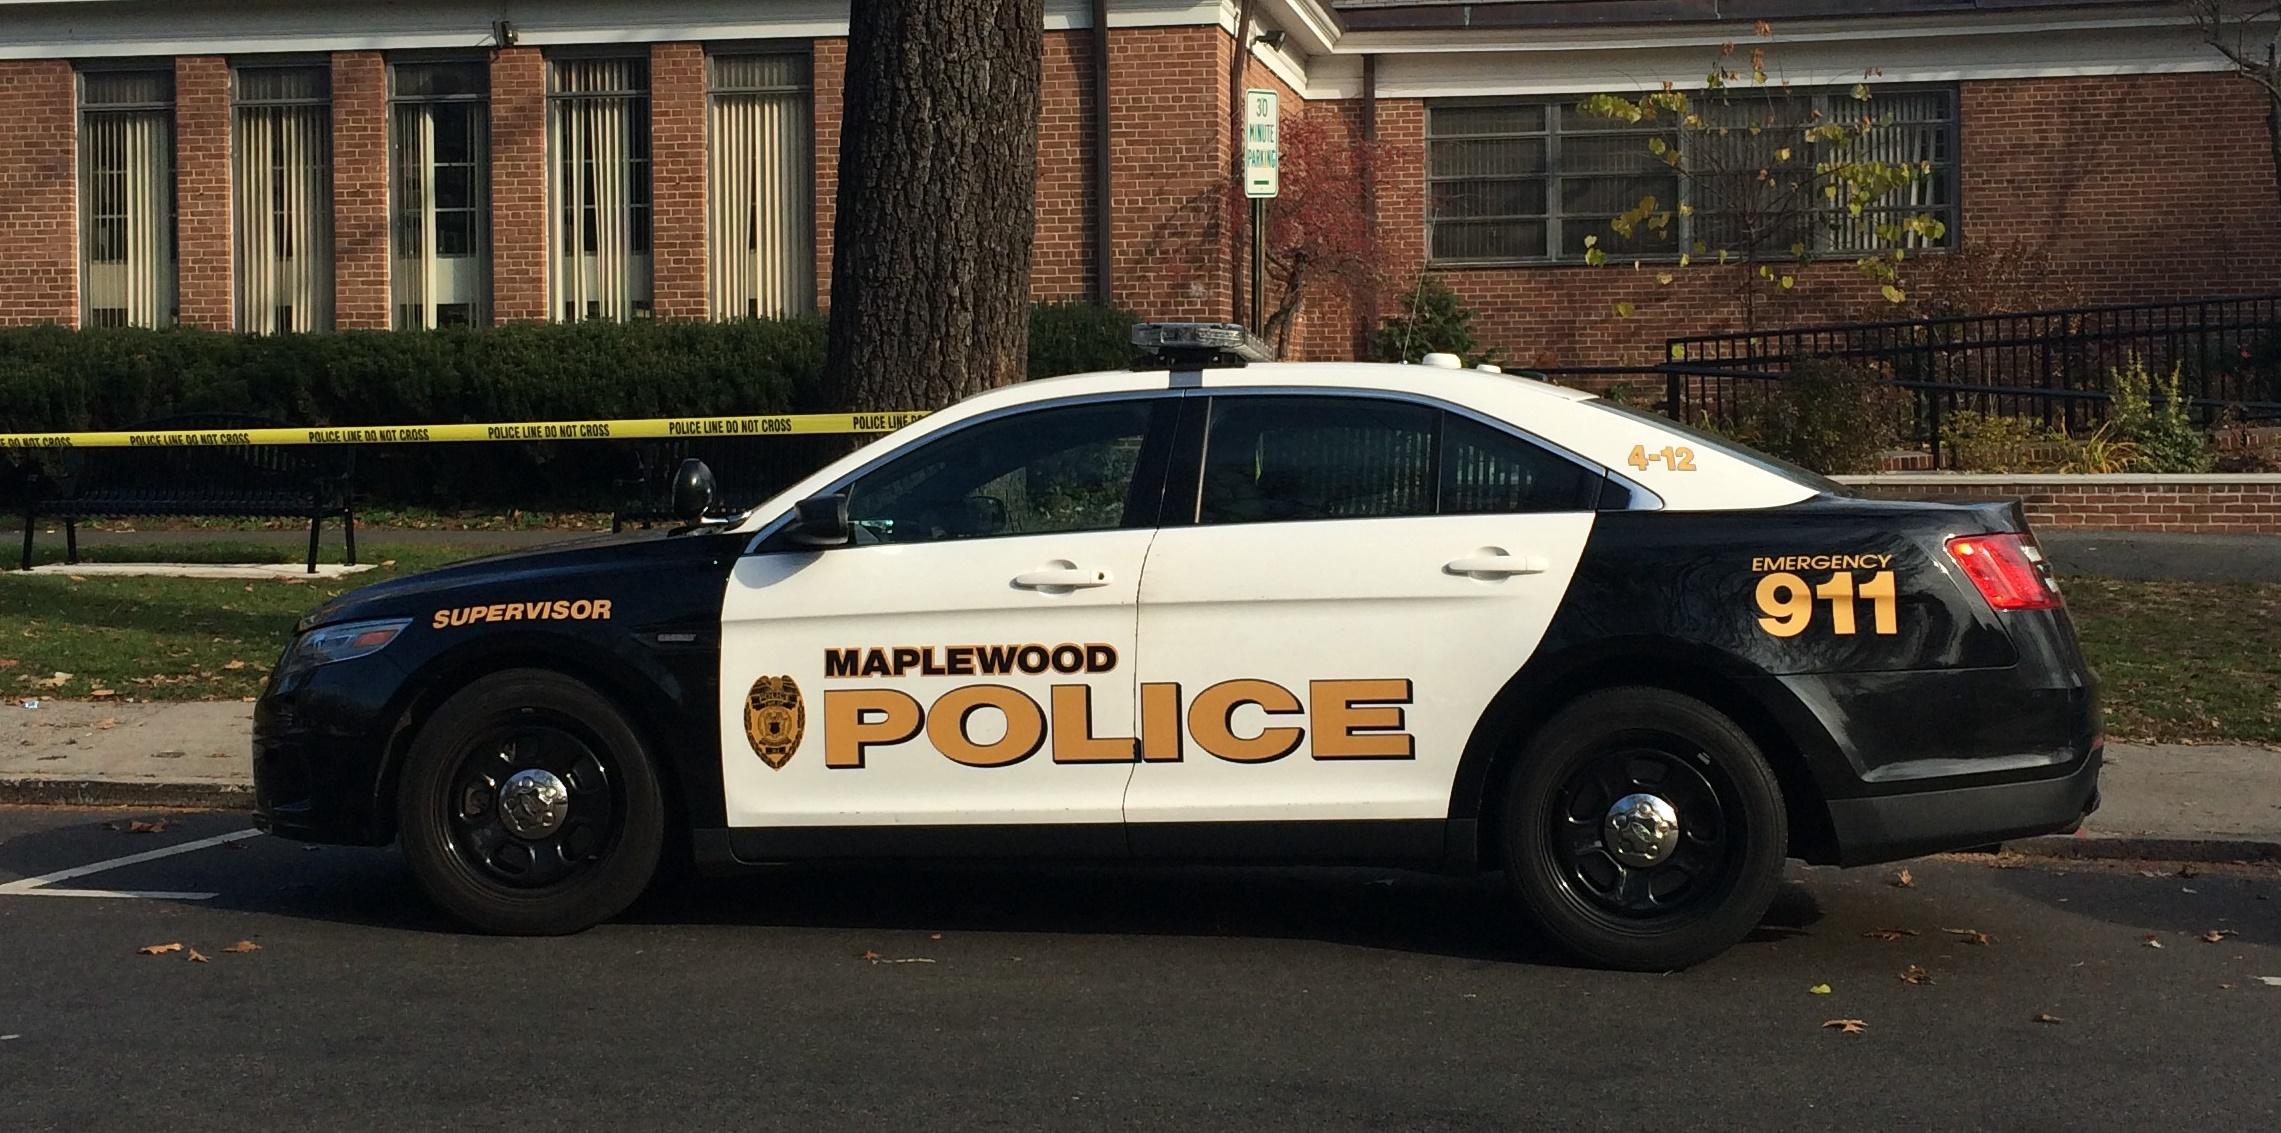 243a7e56b139e71d3095_Maplewood_police_car_2.jpg